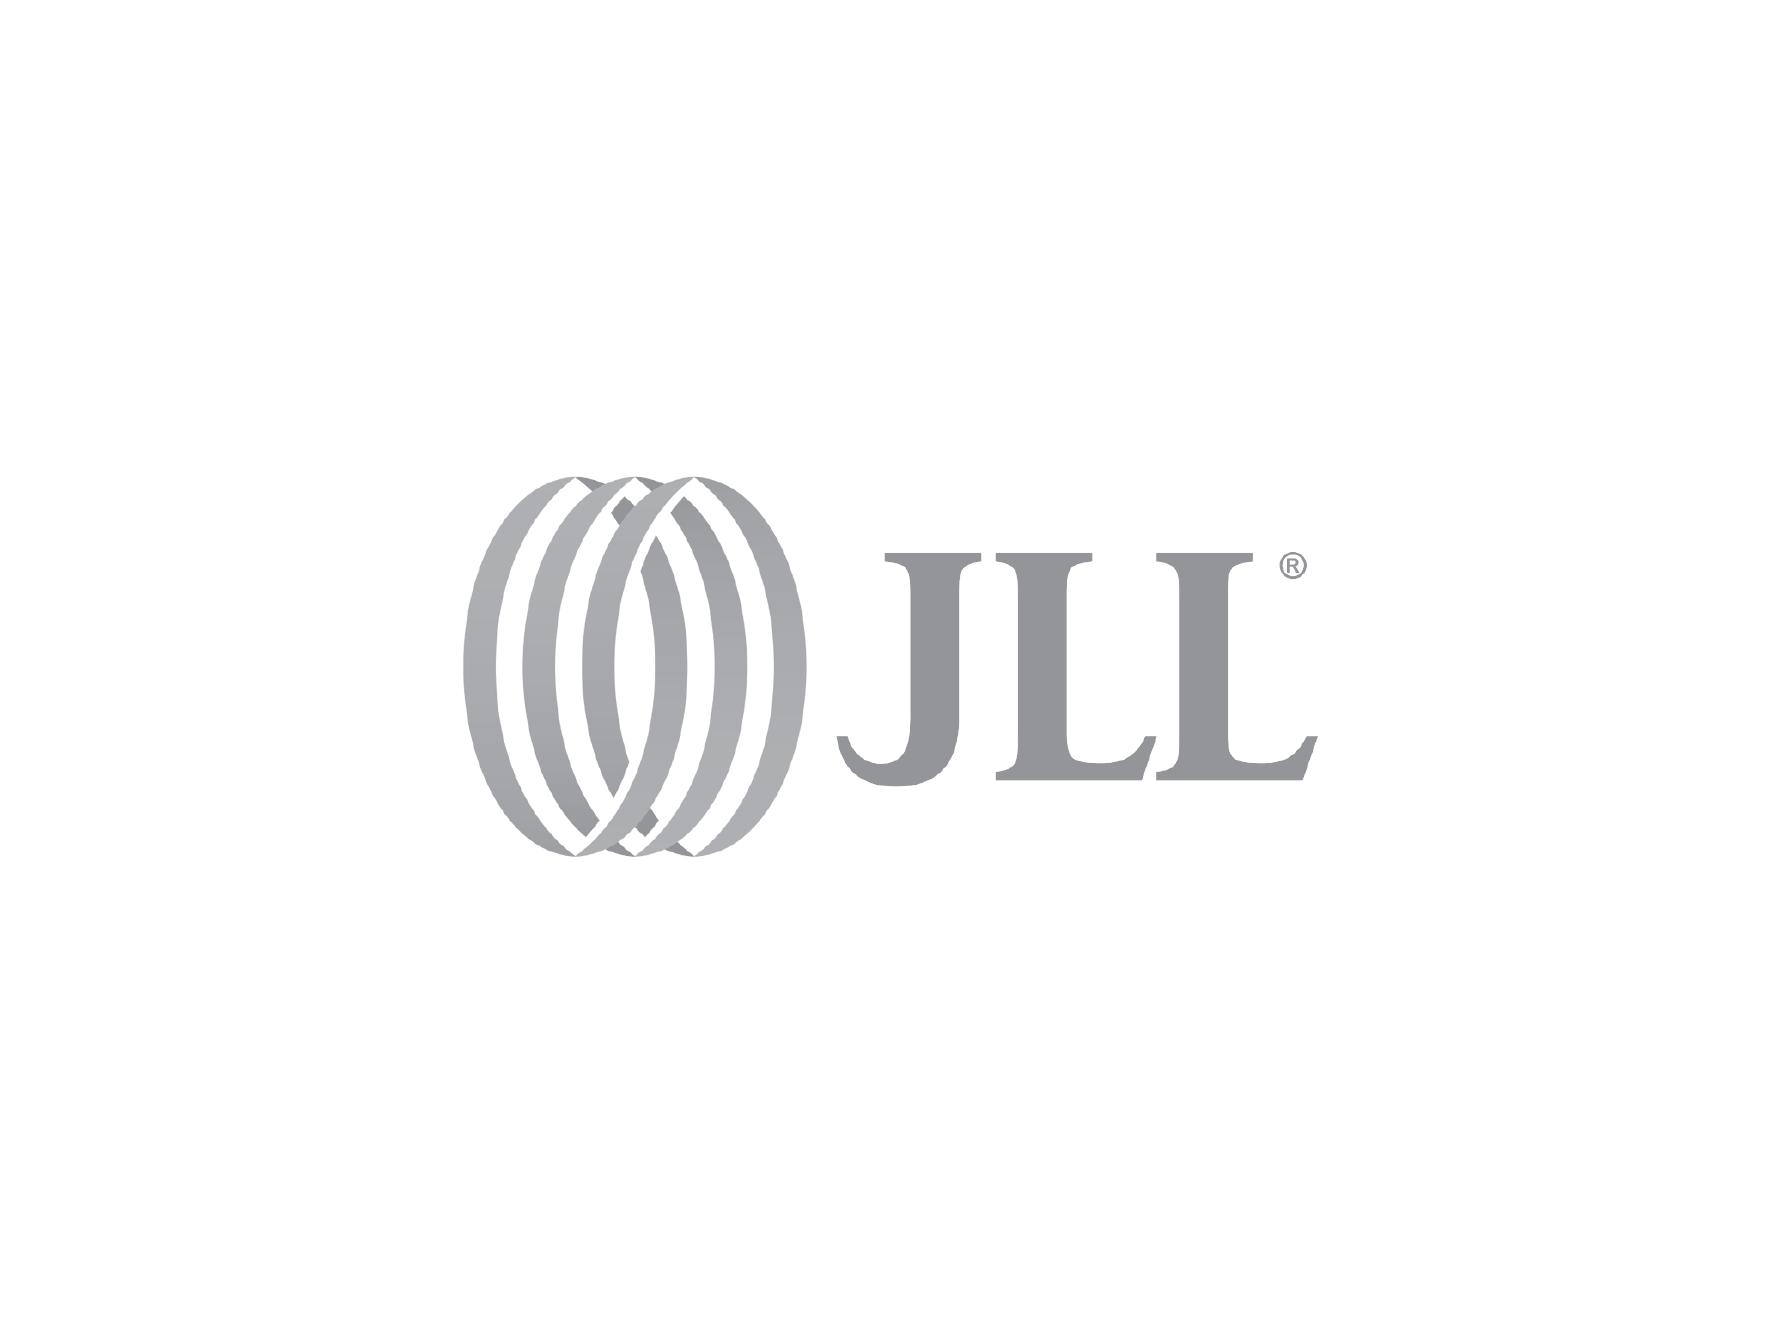 ROCK-0019 RTRX Website Sponsor Page Logos_JLL_v1a.png